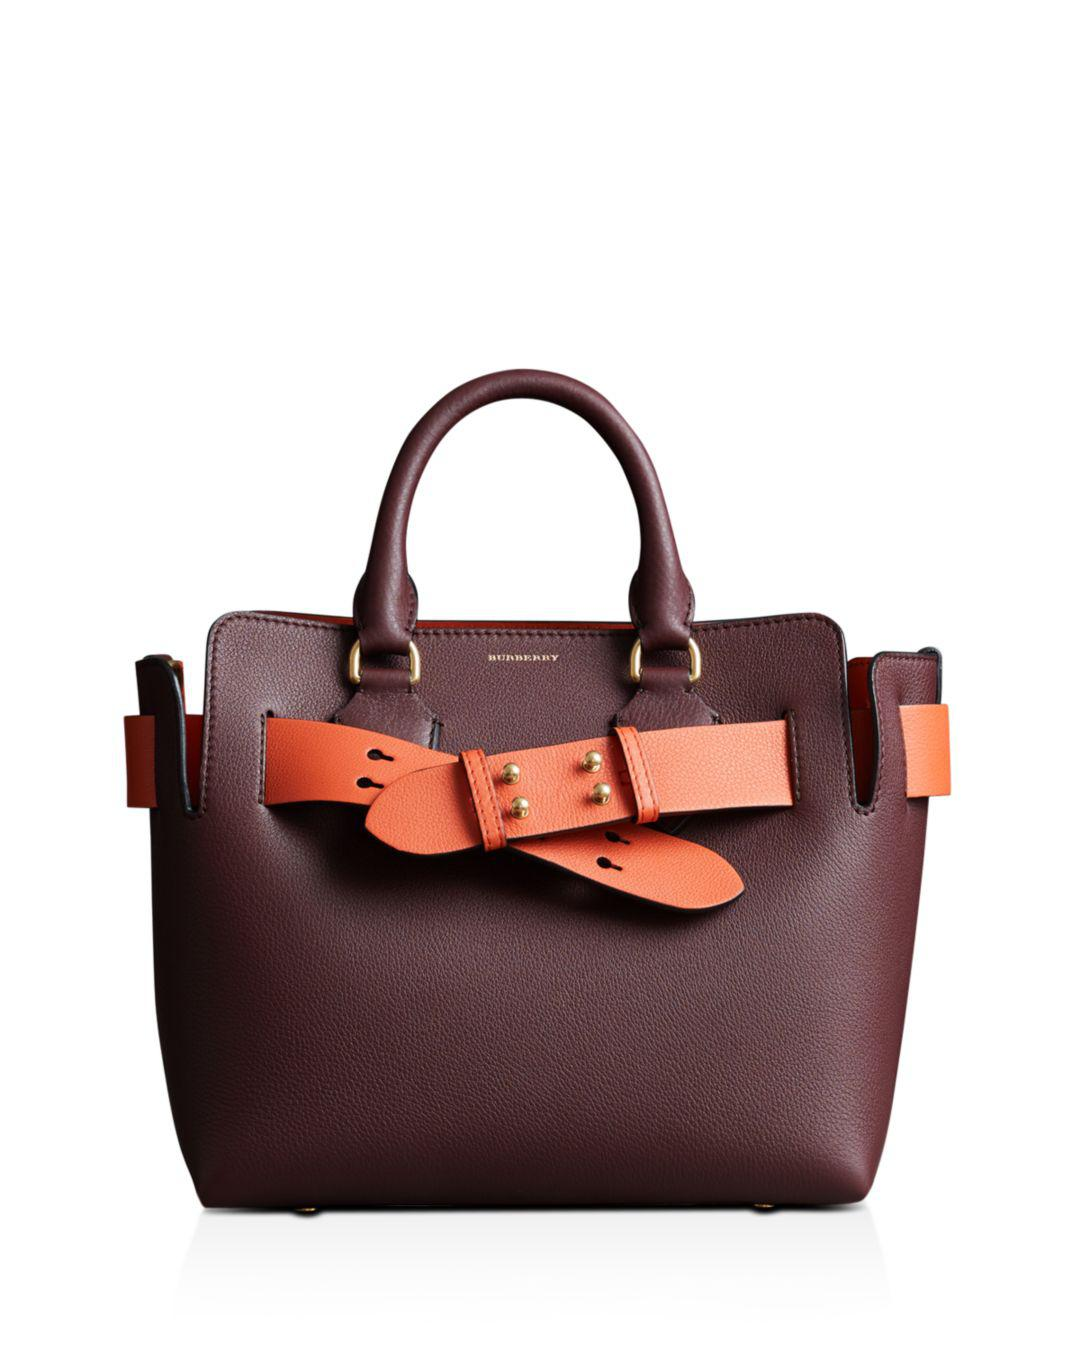 20d7fa9e98c1 Burberry. Women s Small Leather Belt Bag